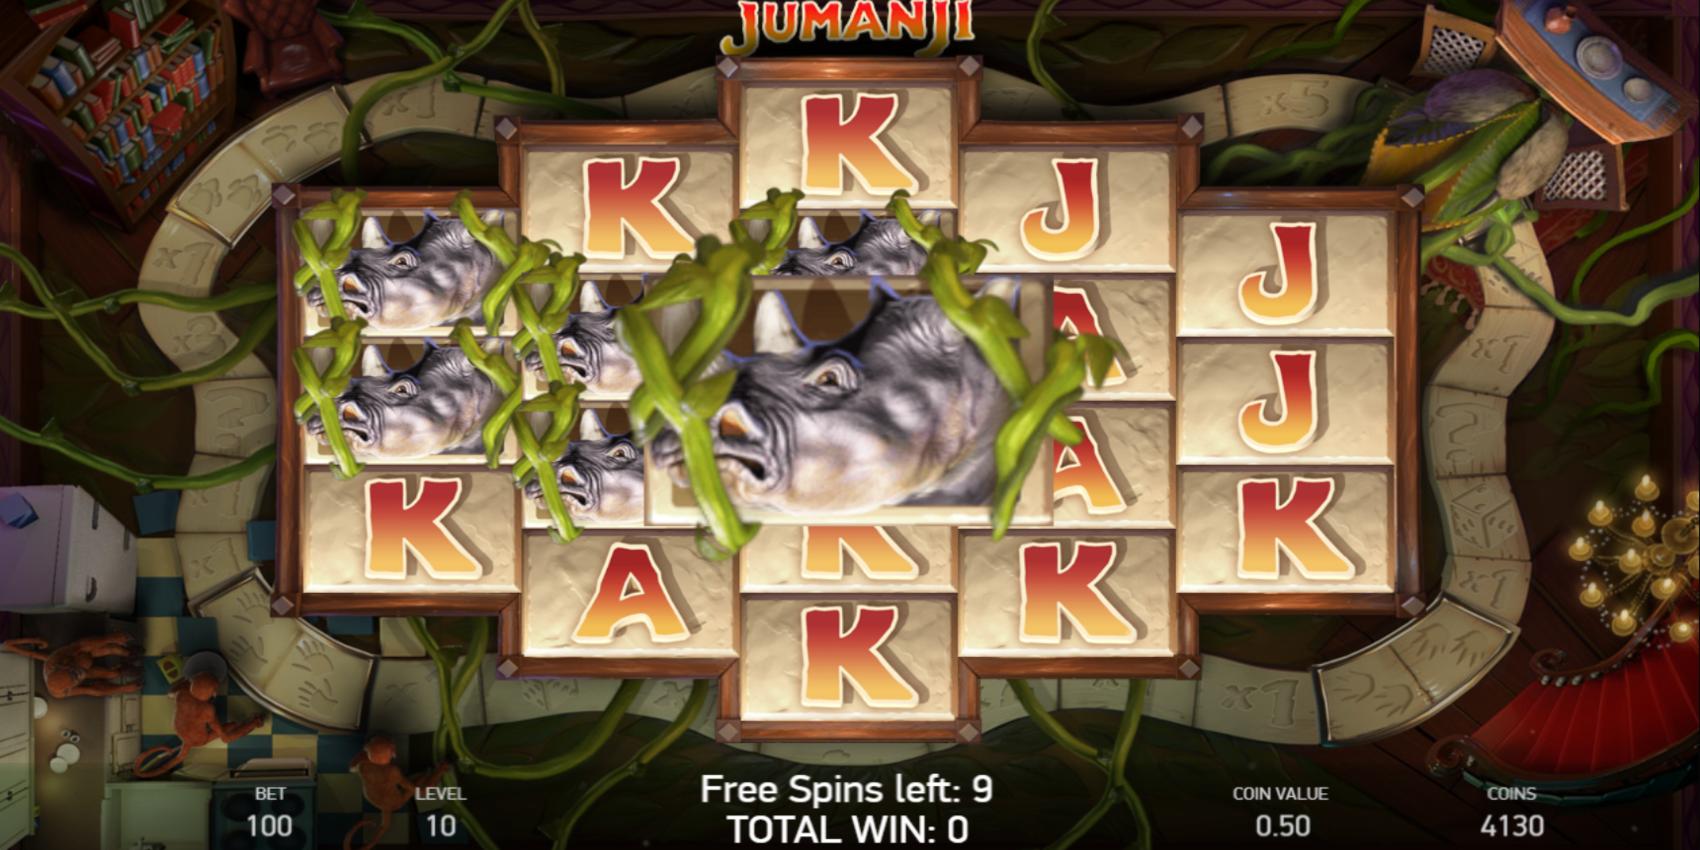 Jumanji slot game Board game Free Spins